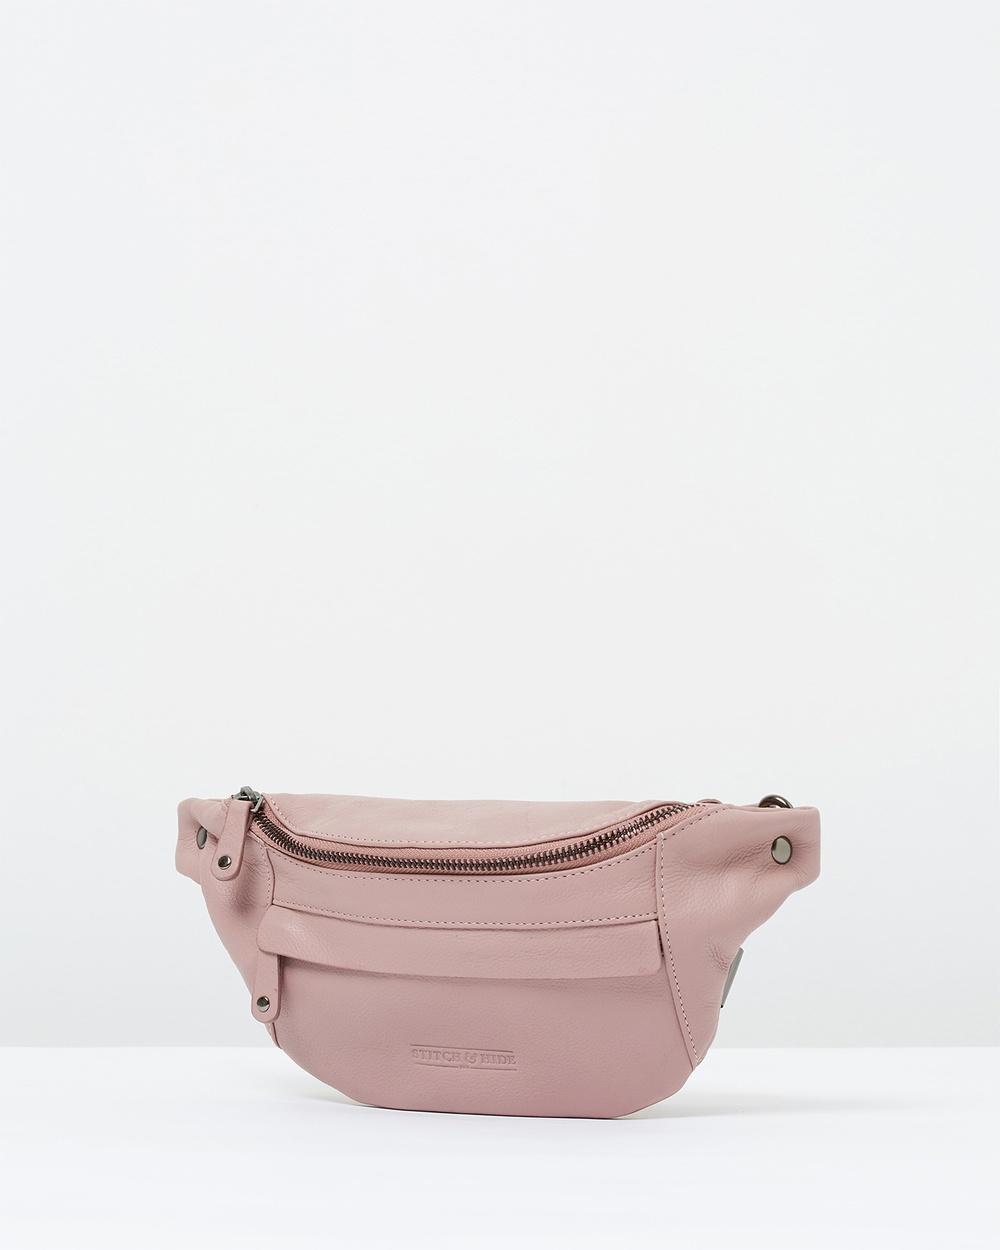 Stitch & Hide Bailey Hip Bag Bum Bags Dusty Rose